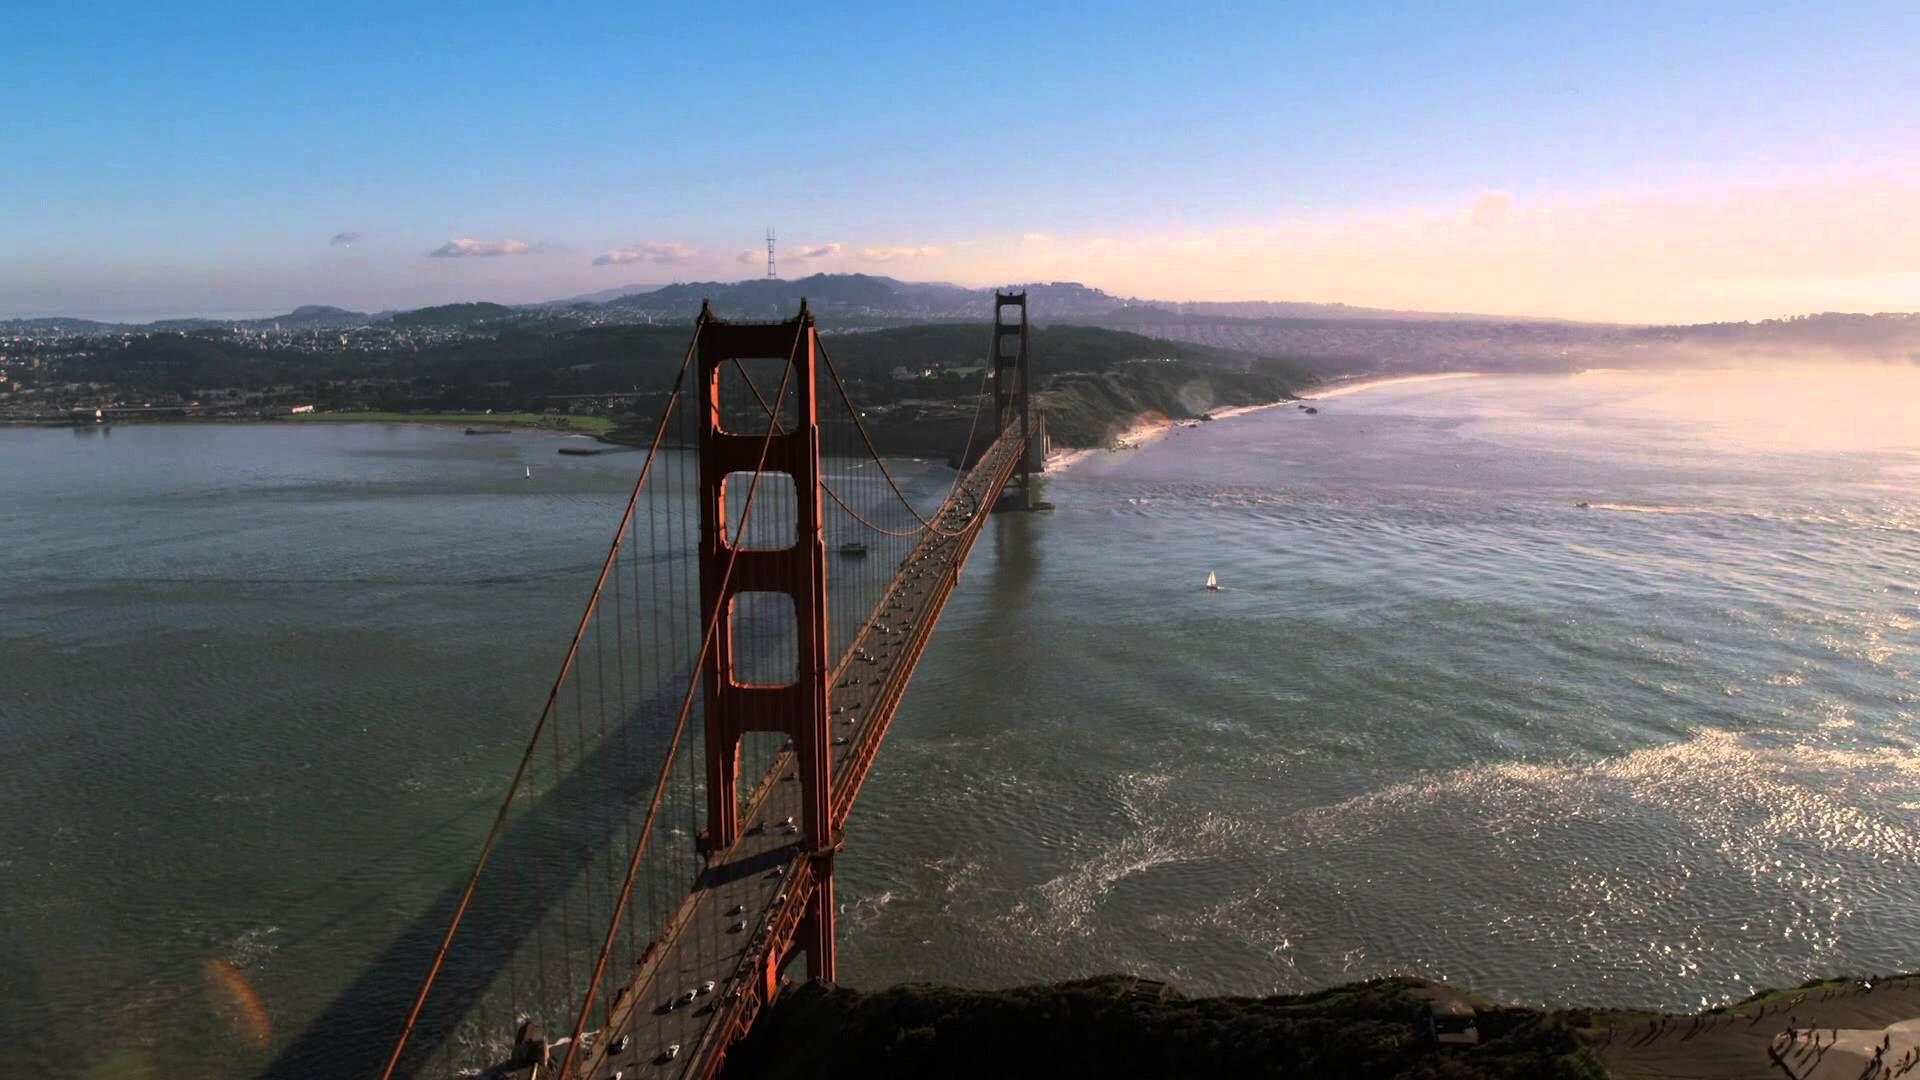 Apple Tv 4 Aerial Screensaver San Francisco Day 3 Download Apple Tv Travel Photography Screen Savers